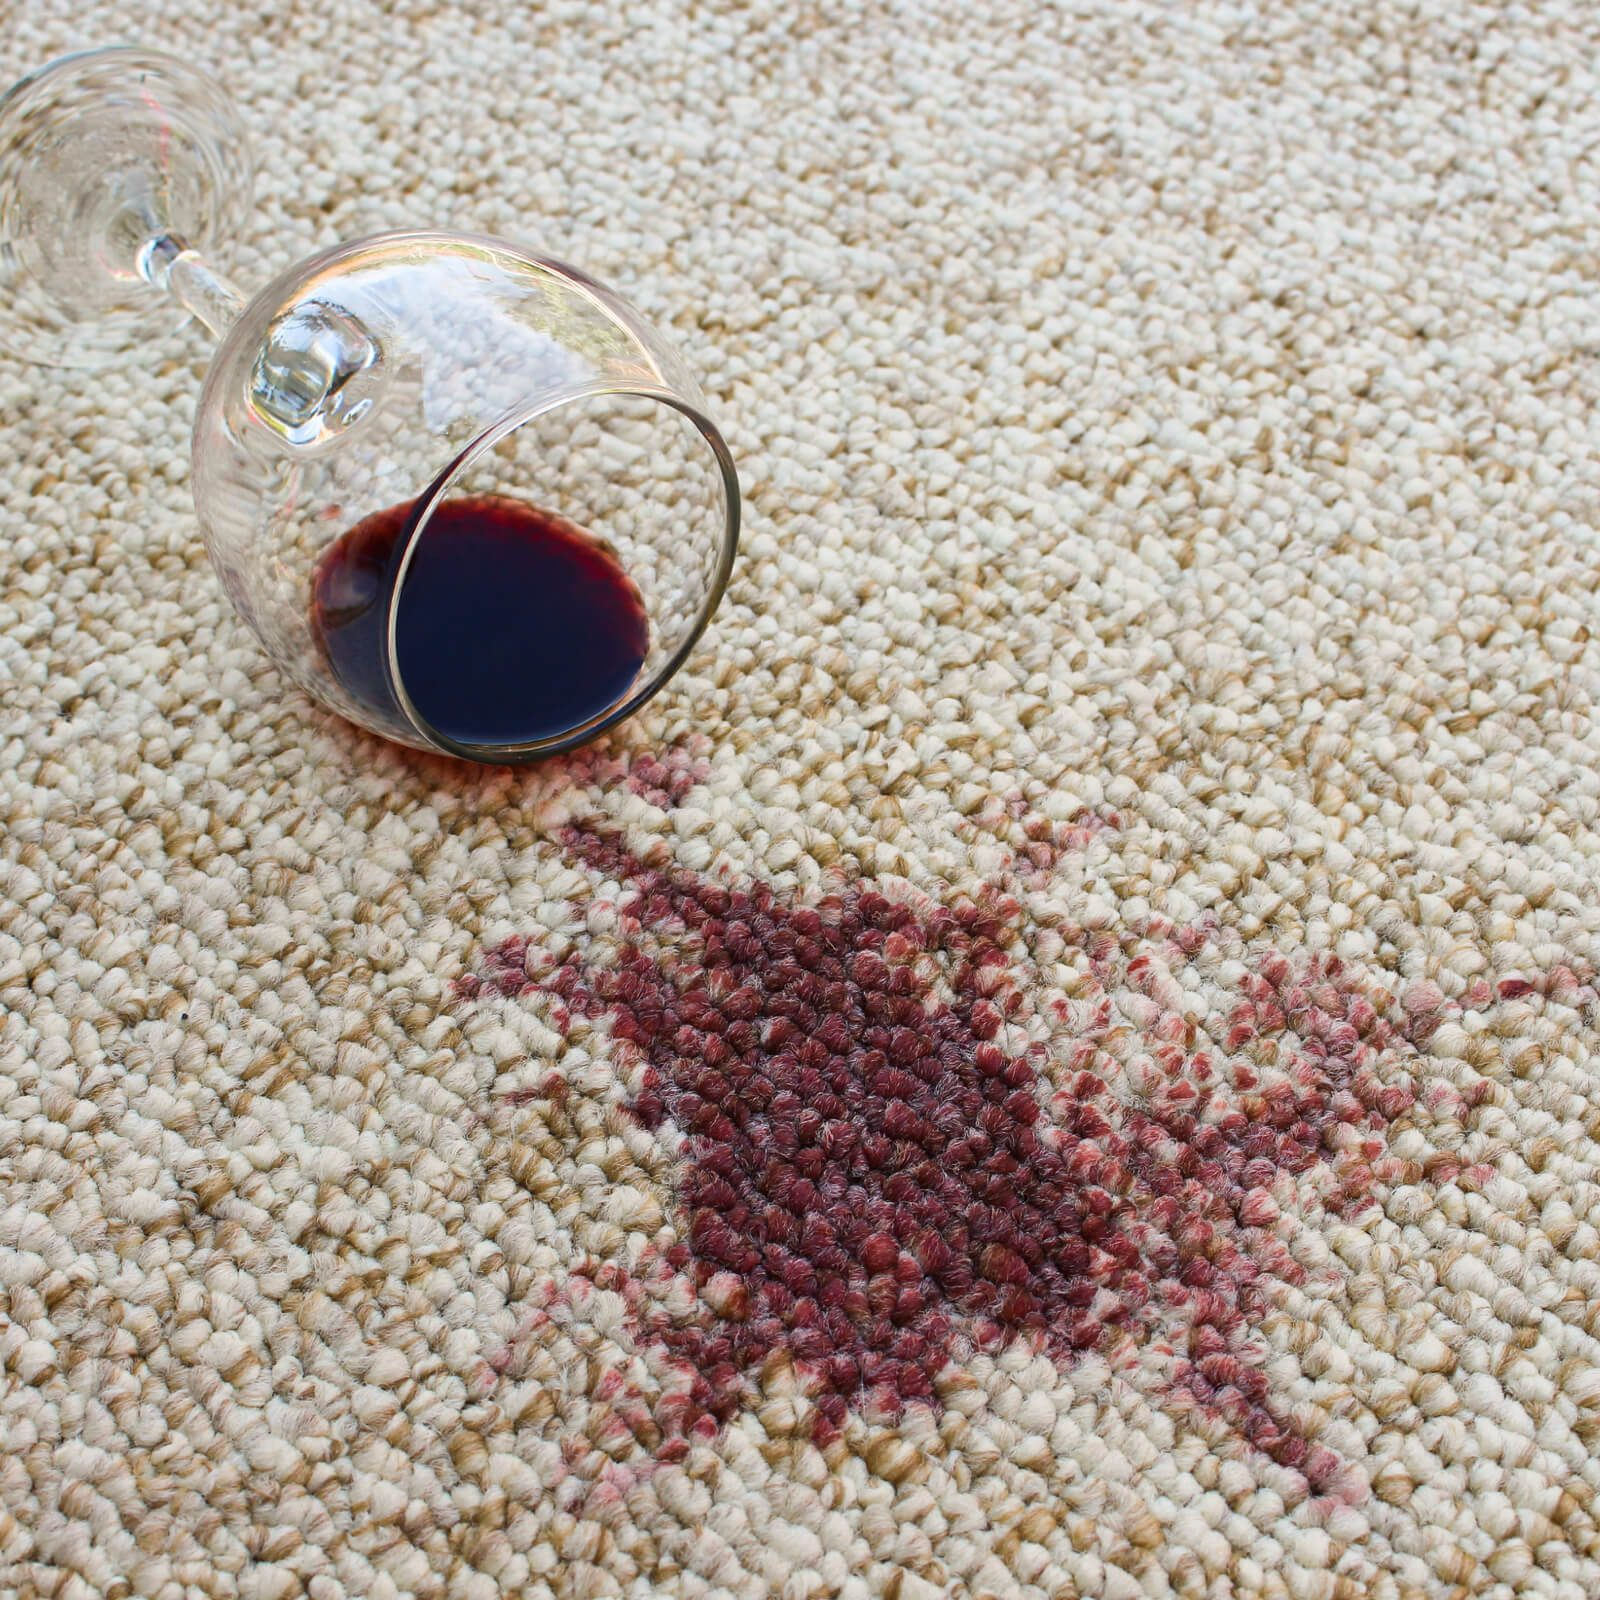 Wine stain on Carpet | Kopp's Carpet & Decorating